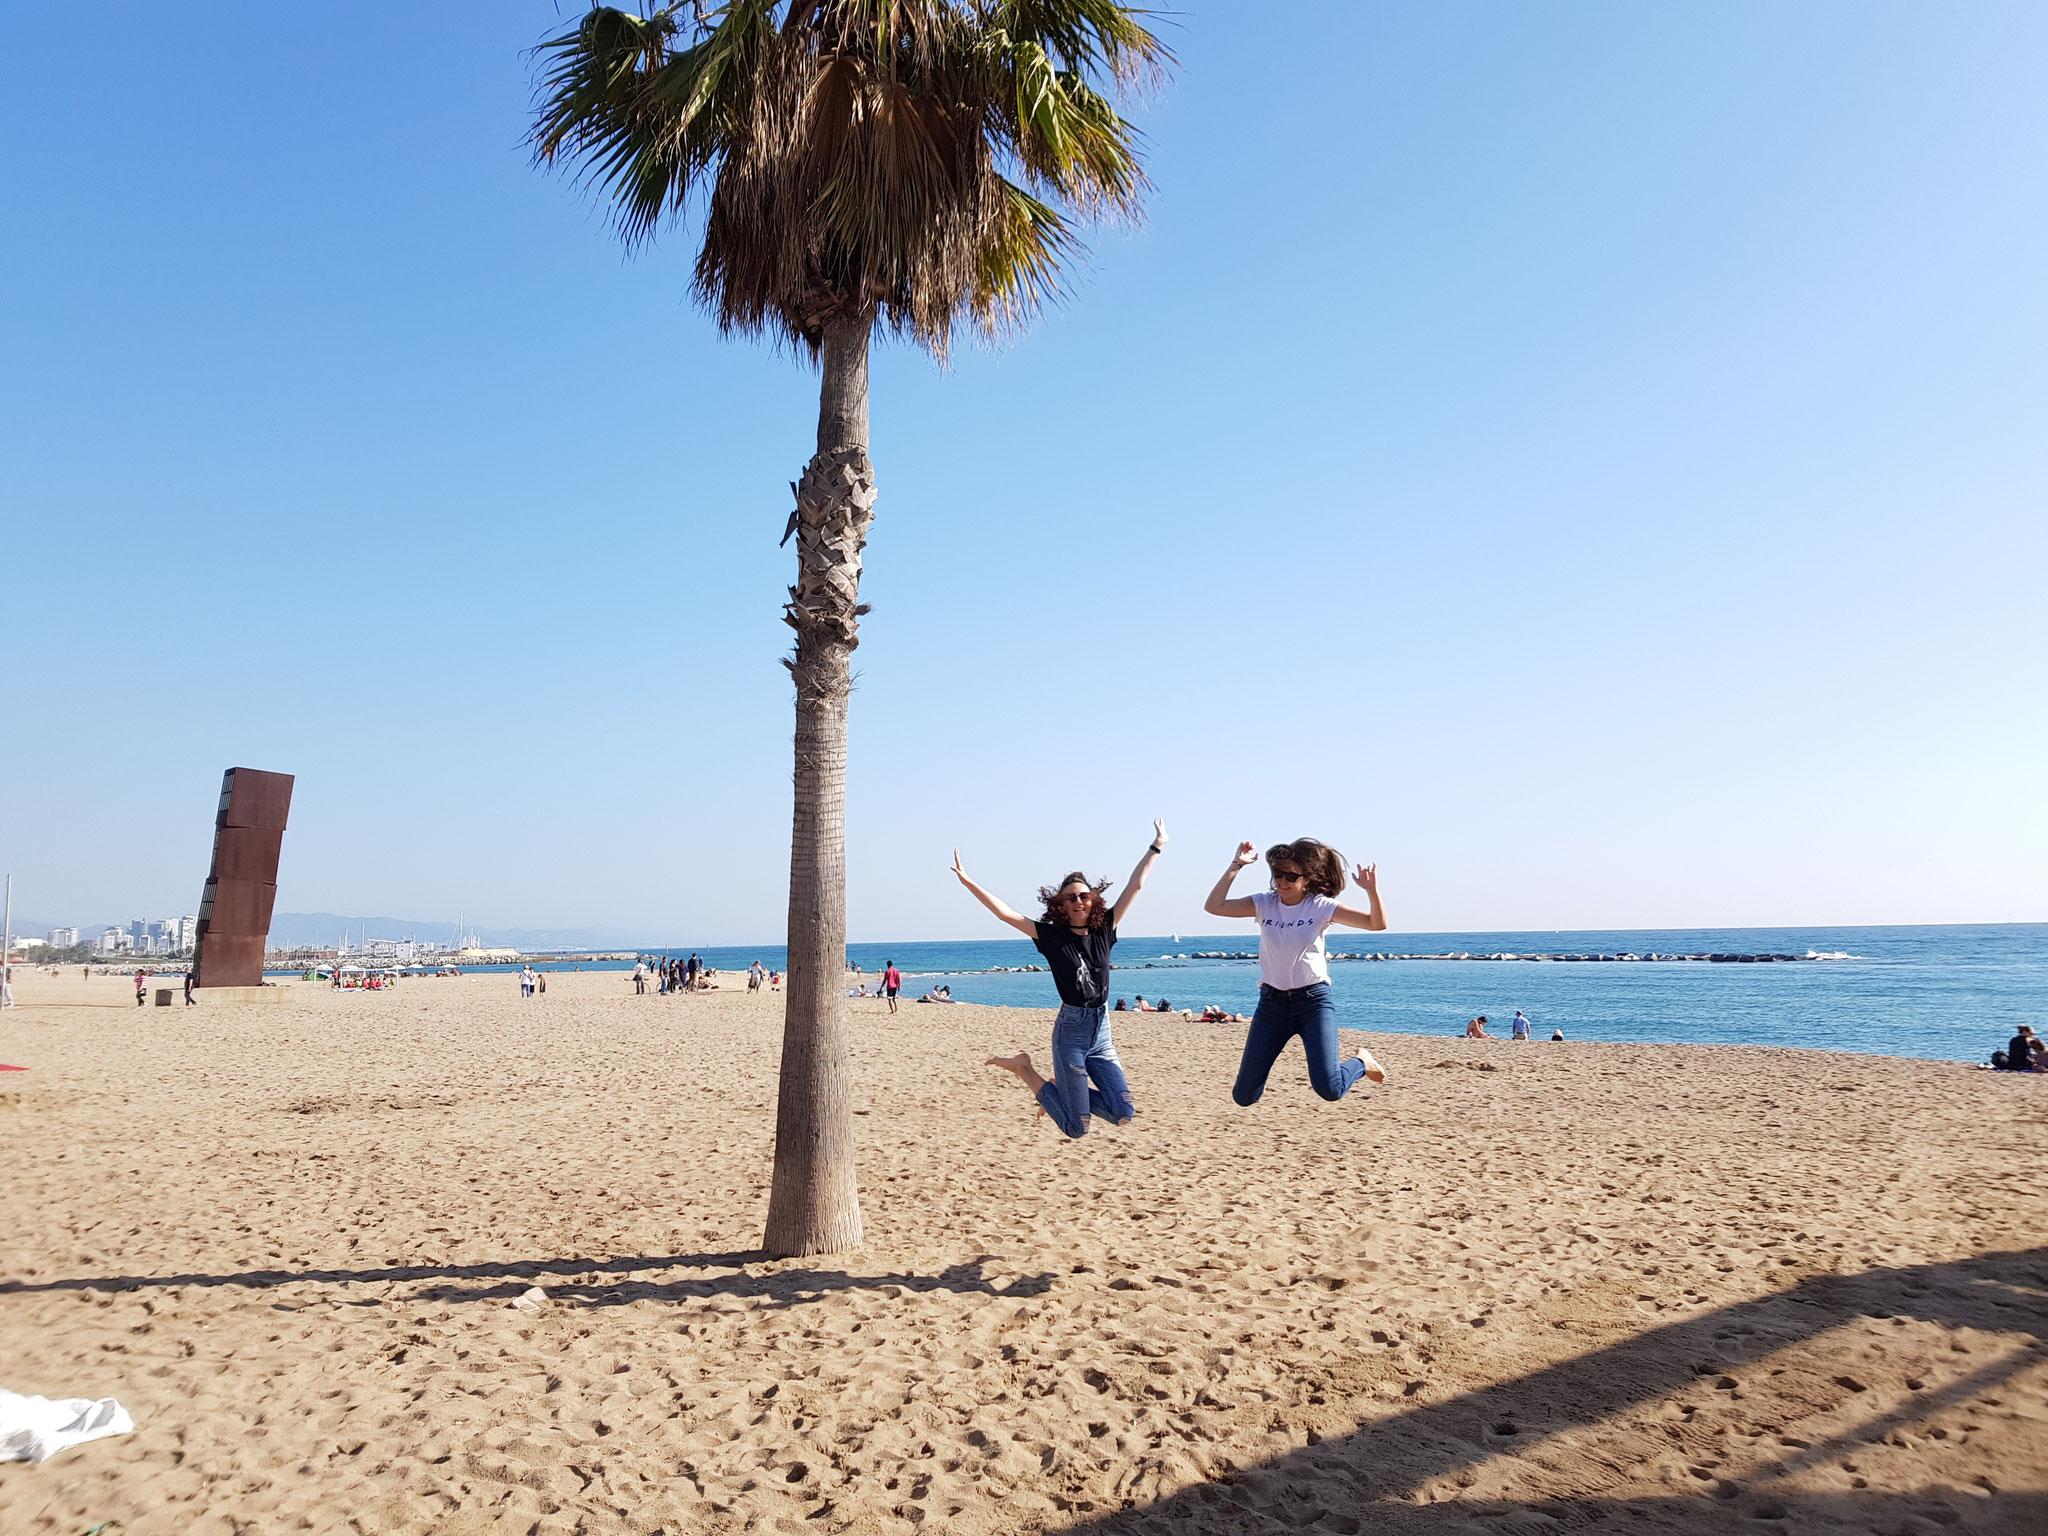 La plage Barceloneta